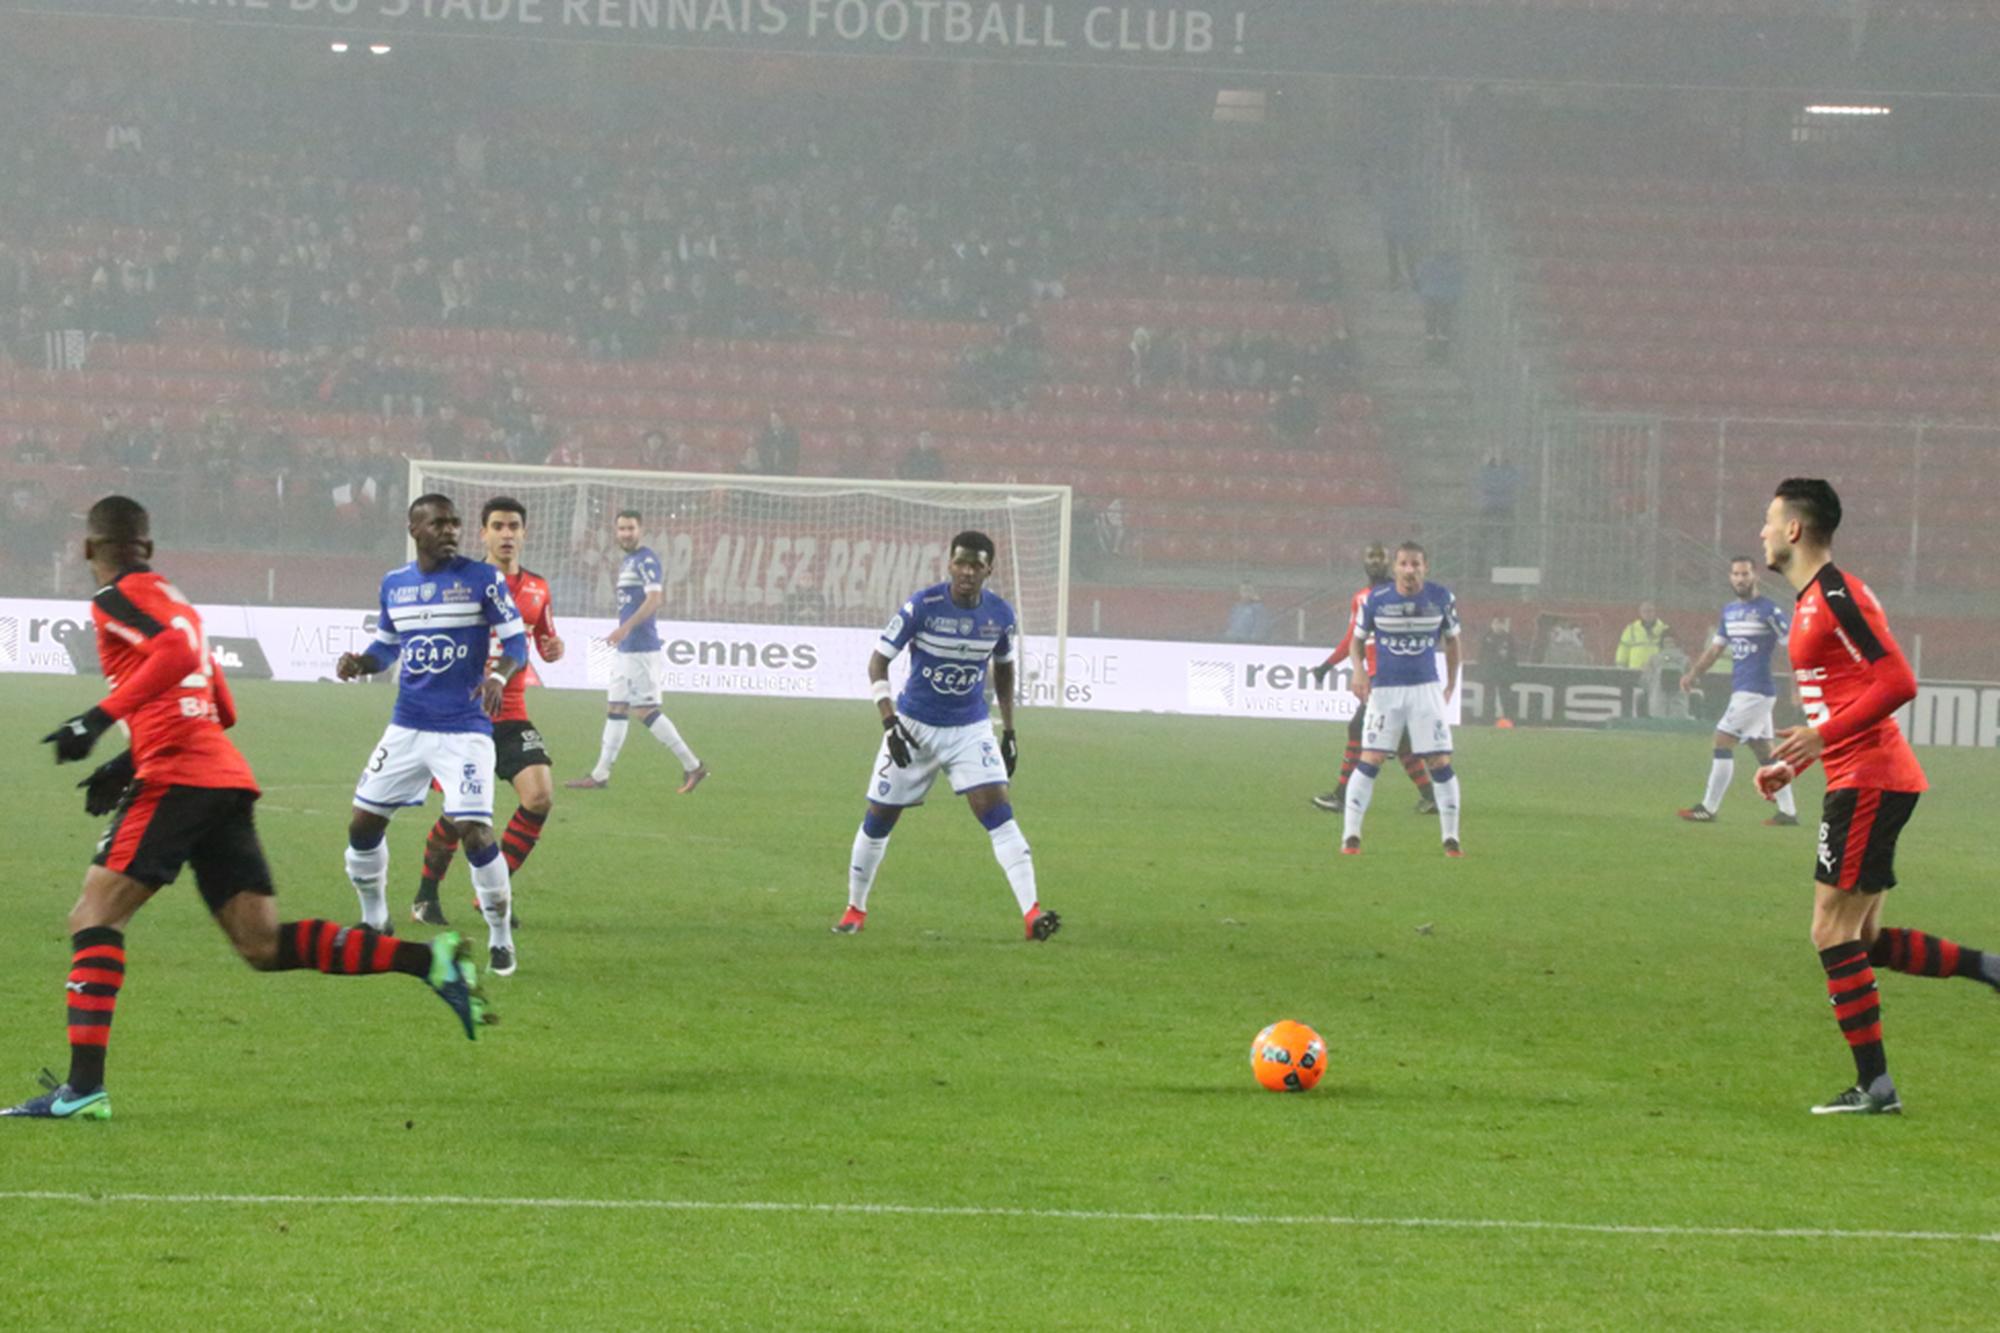 Rennes-Bastia (17/12/16 J18)